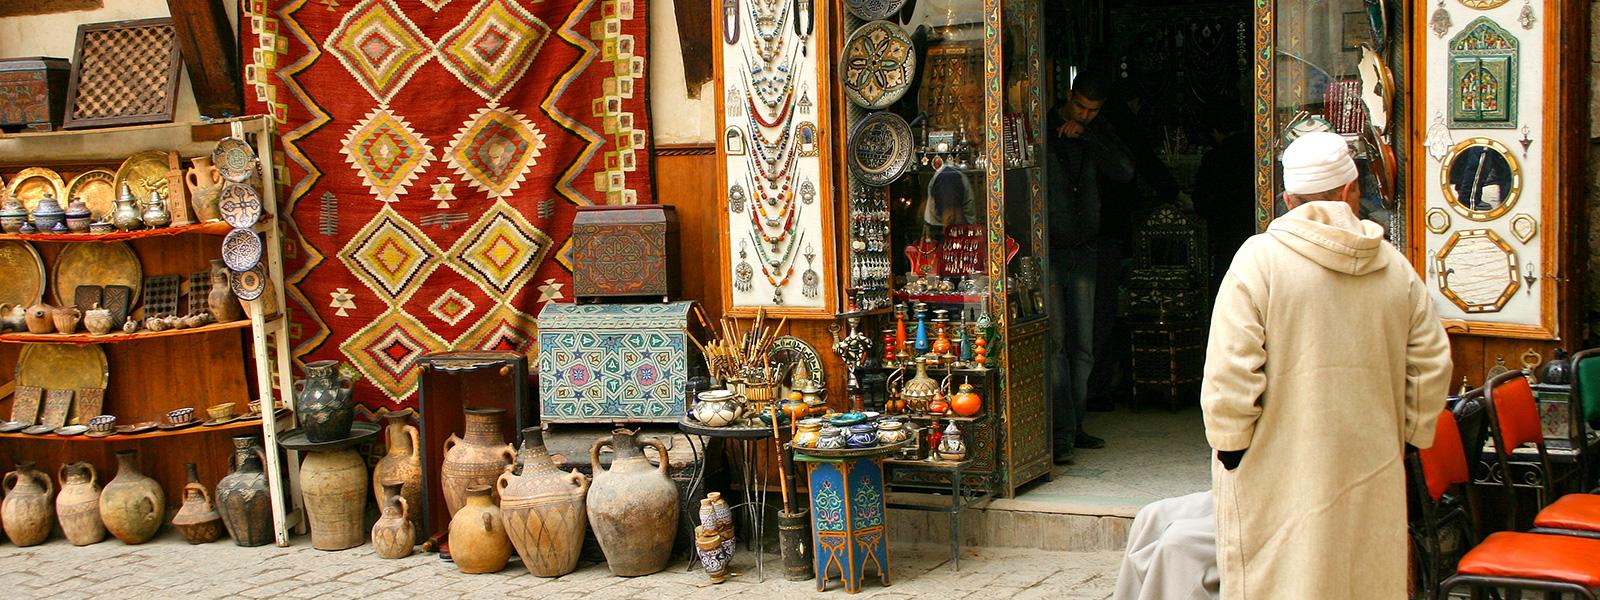 marrakech Koutoubia Bab Mansour el Aleuj Andalusian Gardens Musée  Jemaa el-Fna Ménara Palais de la Bahia Tombeaux saadiens